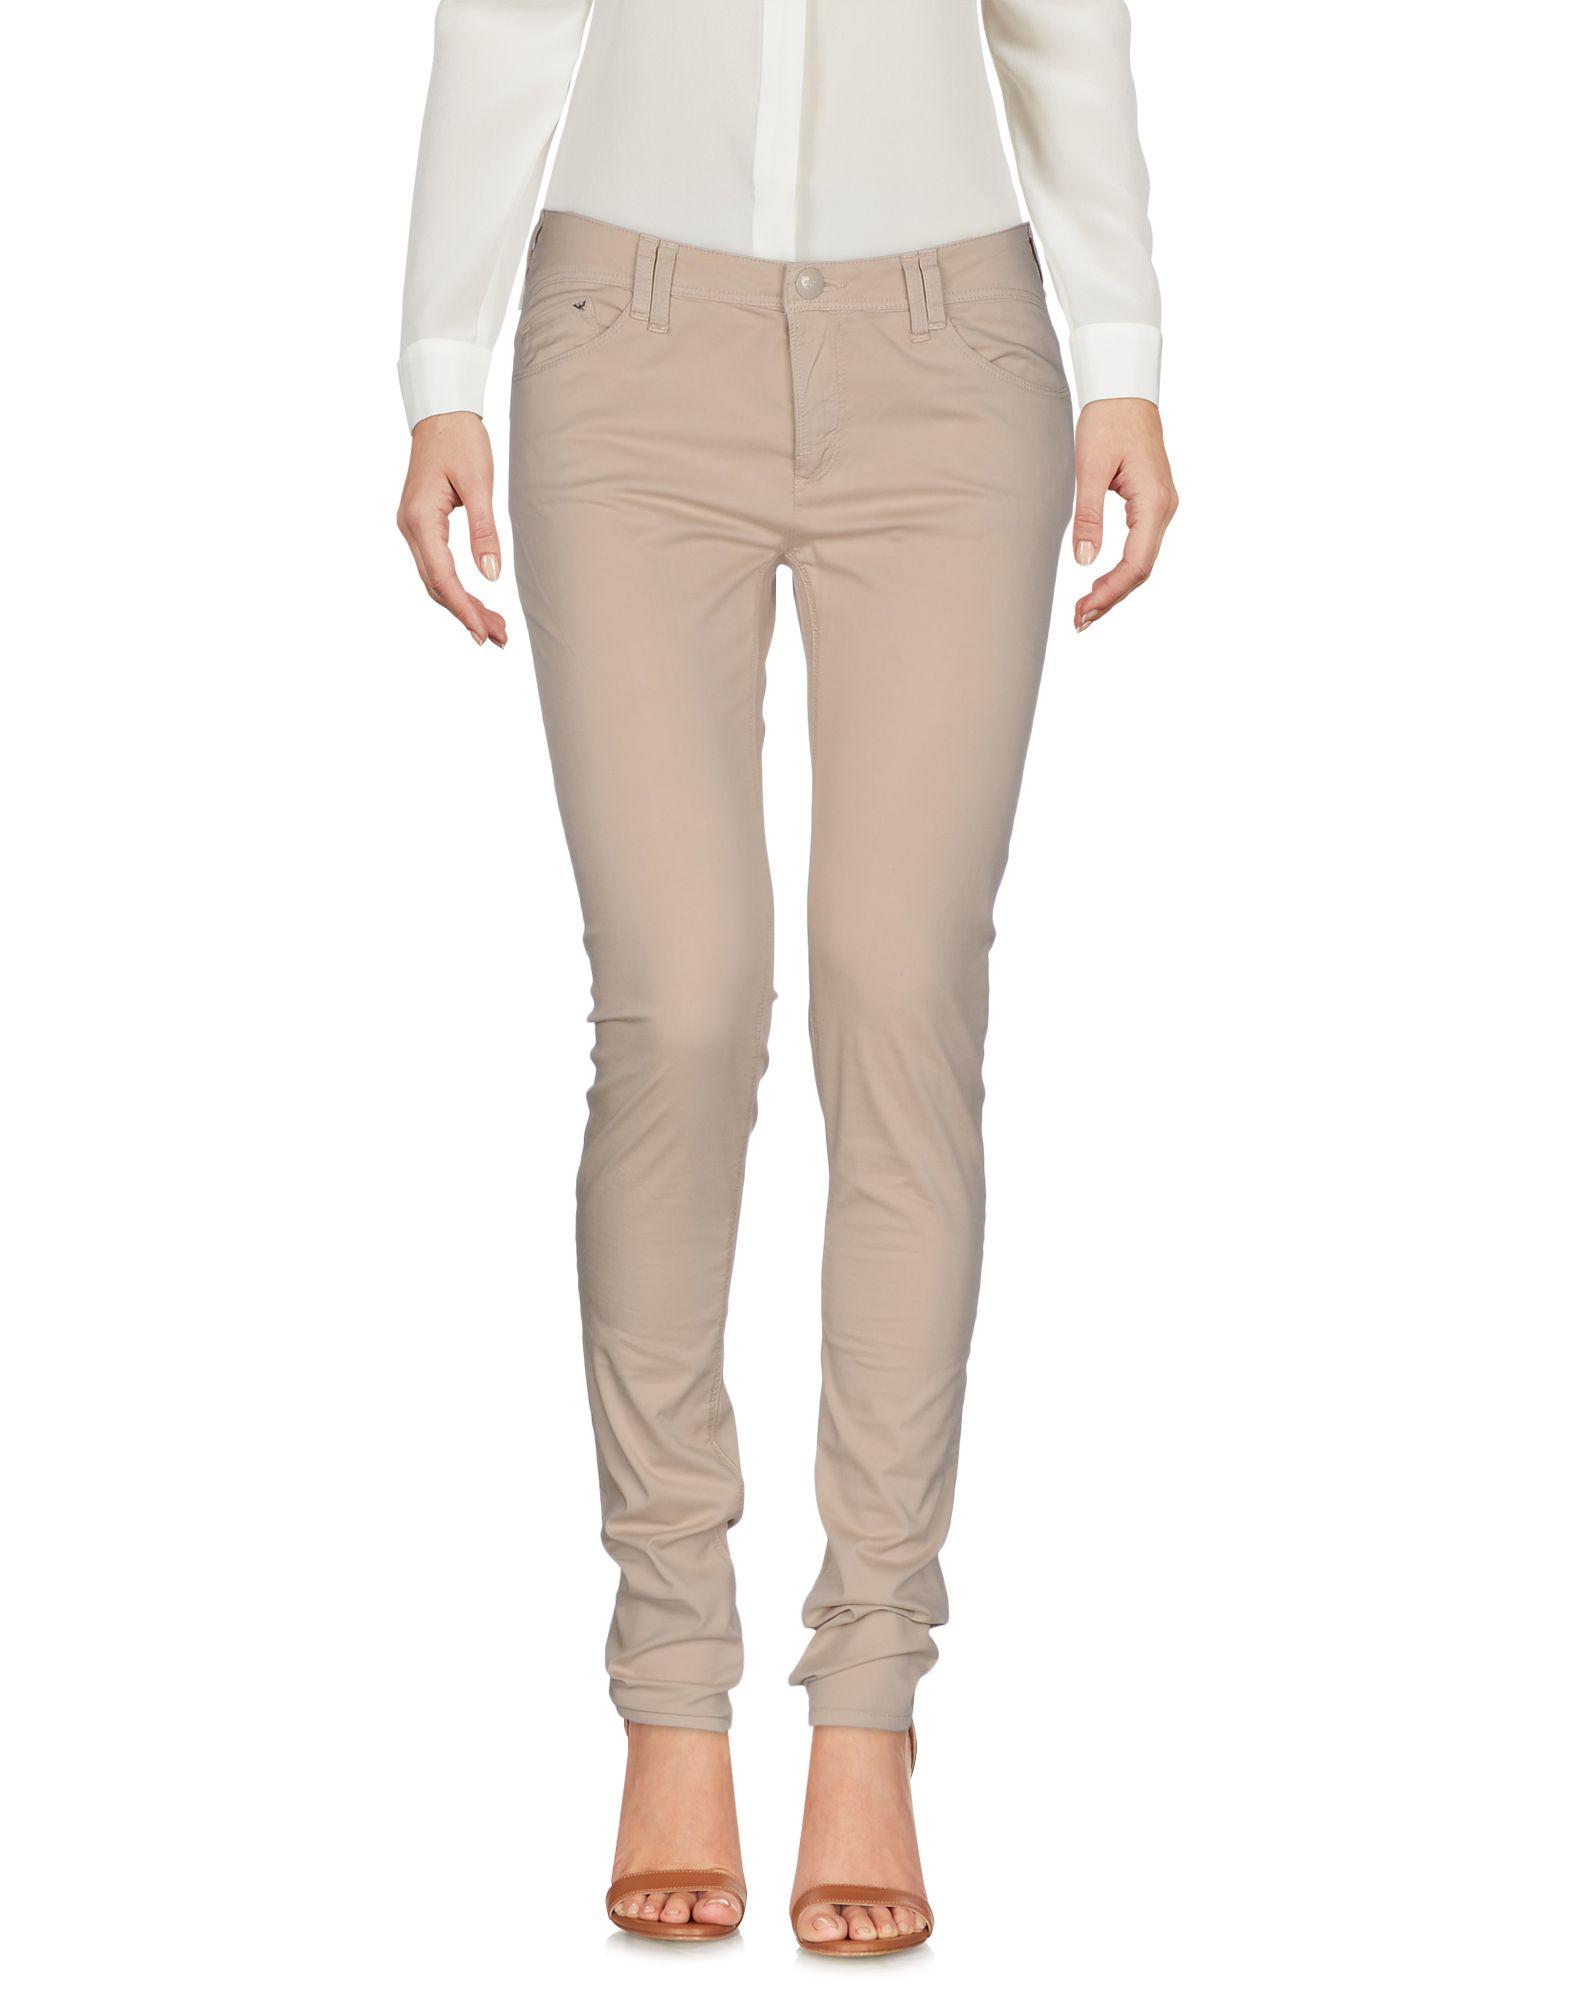 Pantalone Armani Jeans Jeans donna - 13105510TT  klassischer Stil